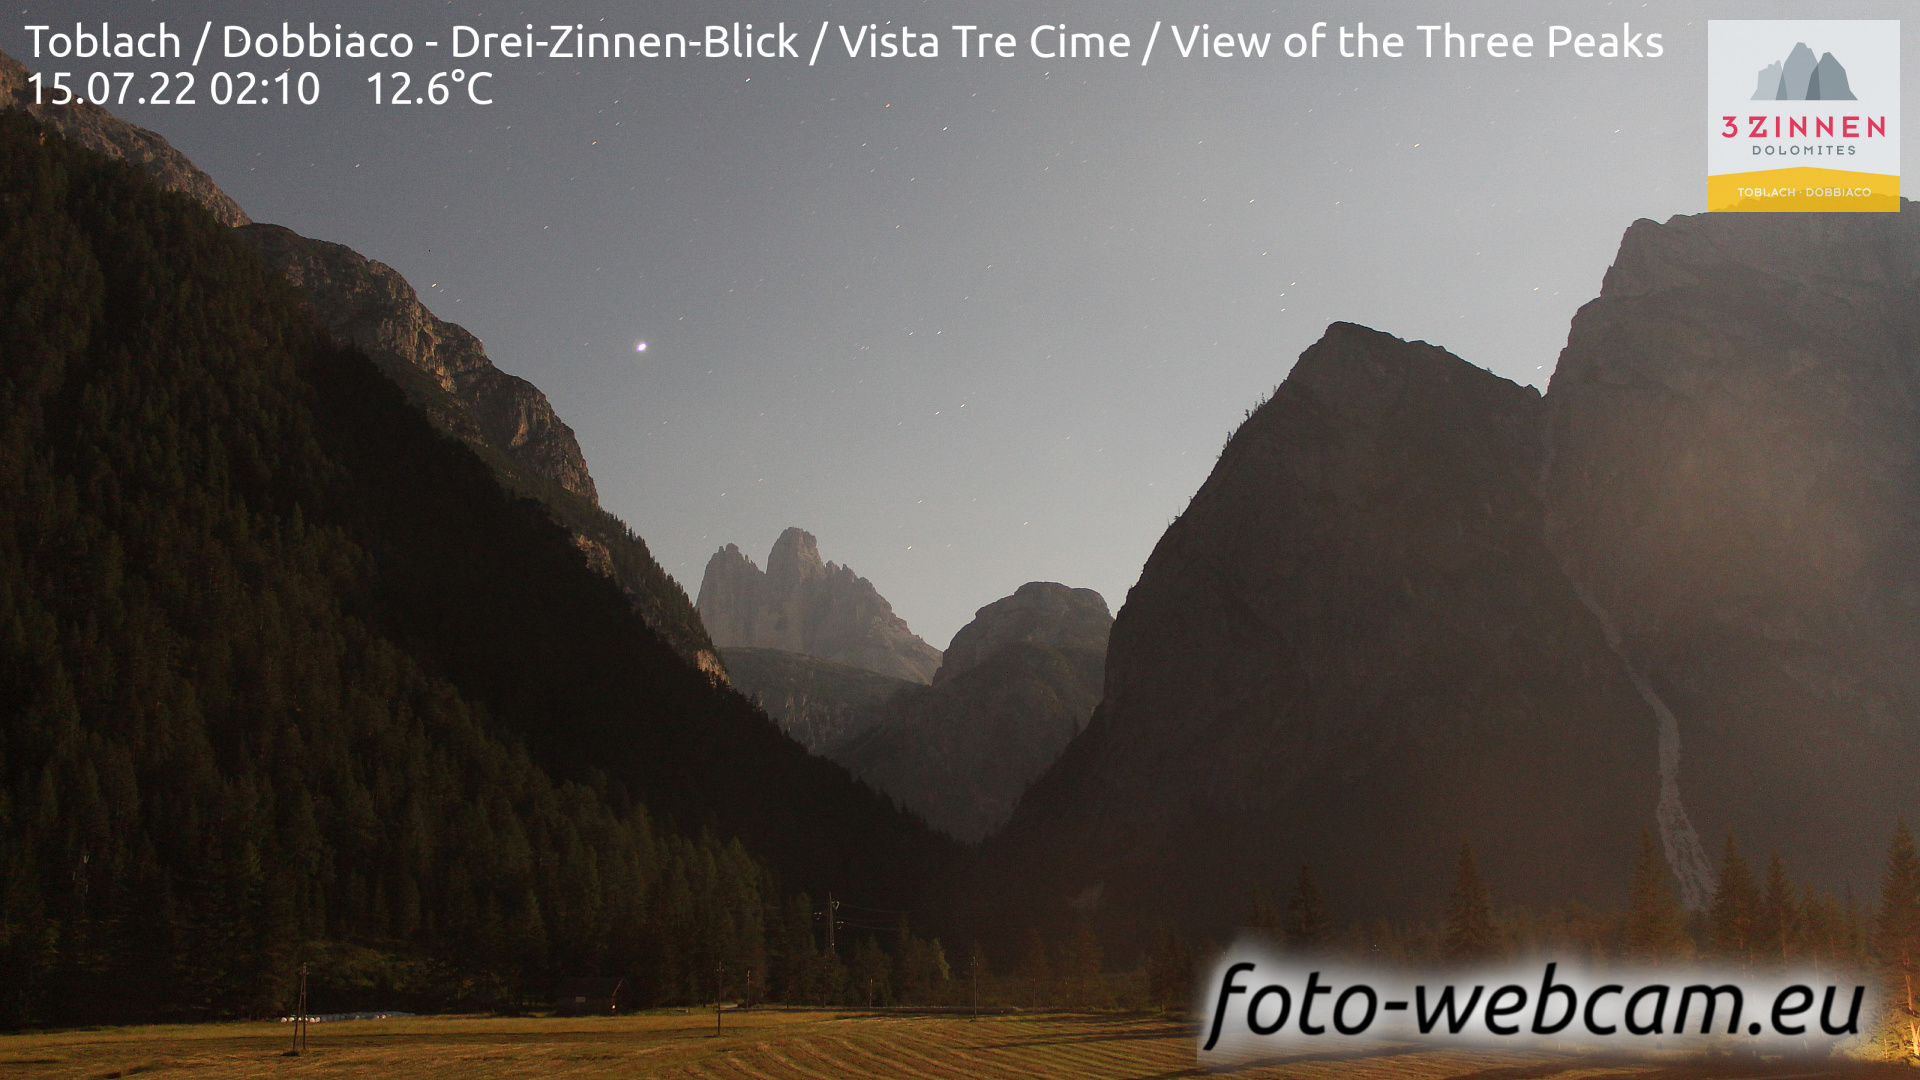 Toblach (Dolomiten) Do. 02:27